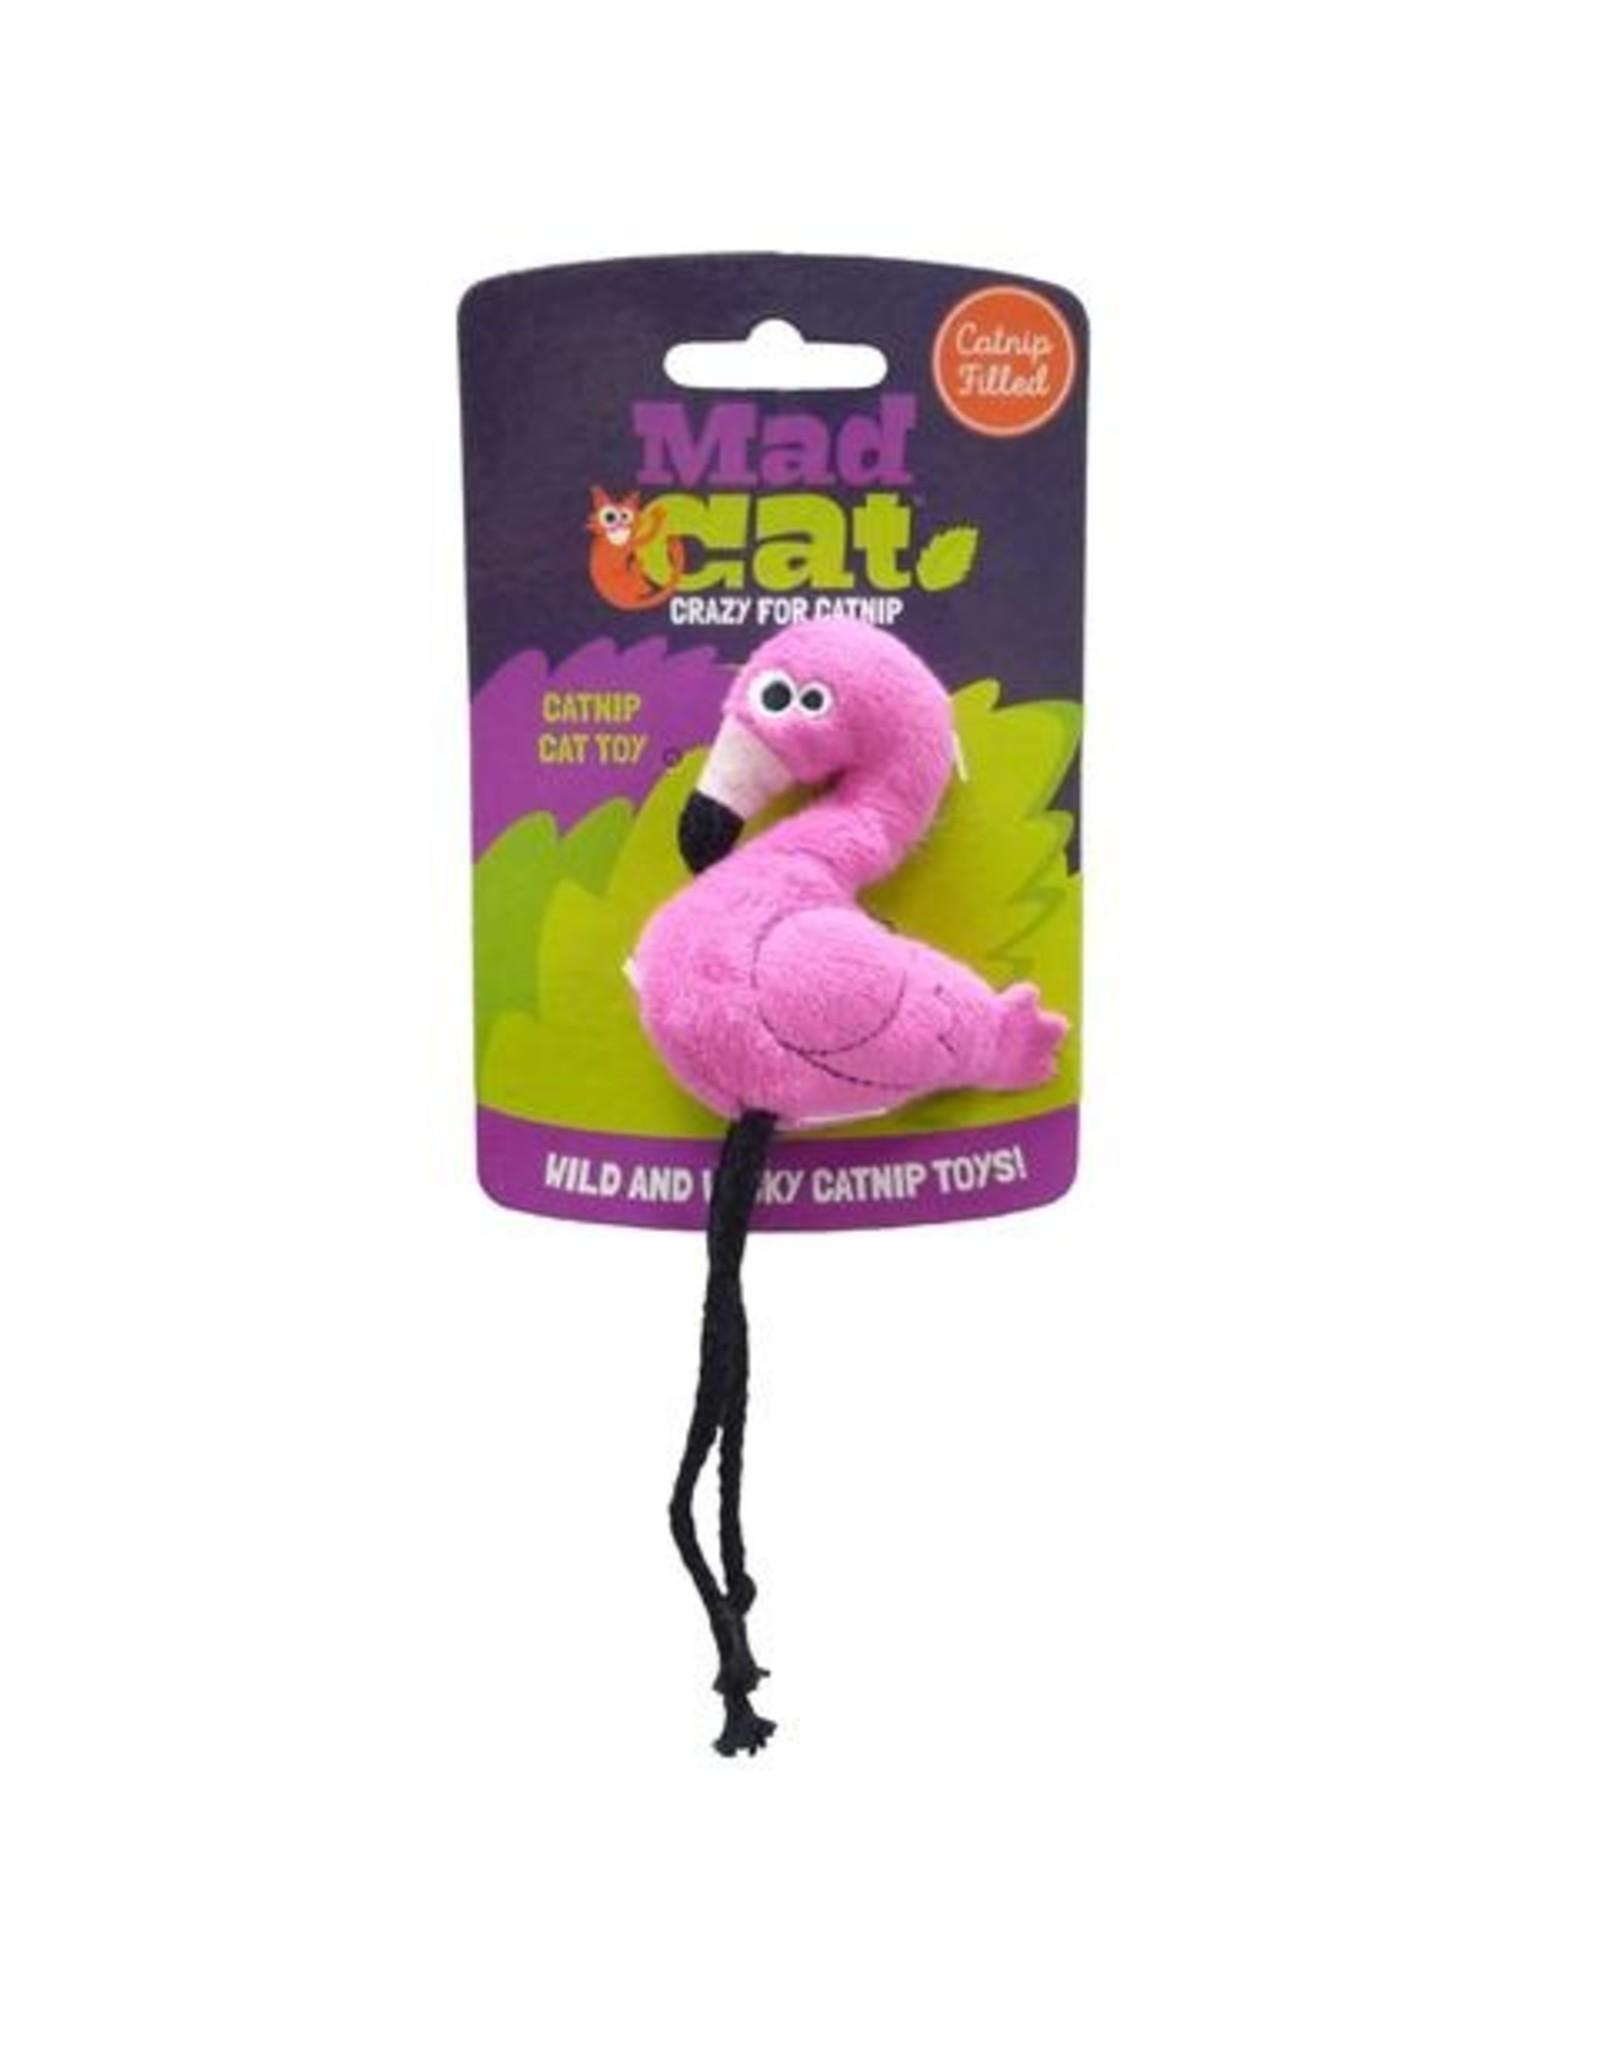 Mad Cat by Cosmic Mad Cat Flingin' Flamingo Plush Catnip and Silvervine Cat Toy